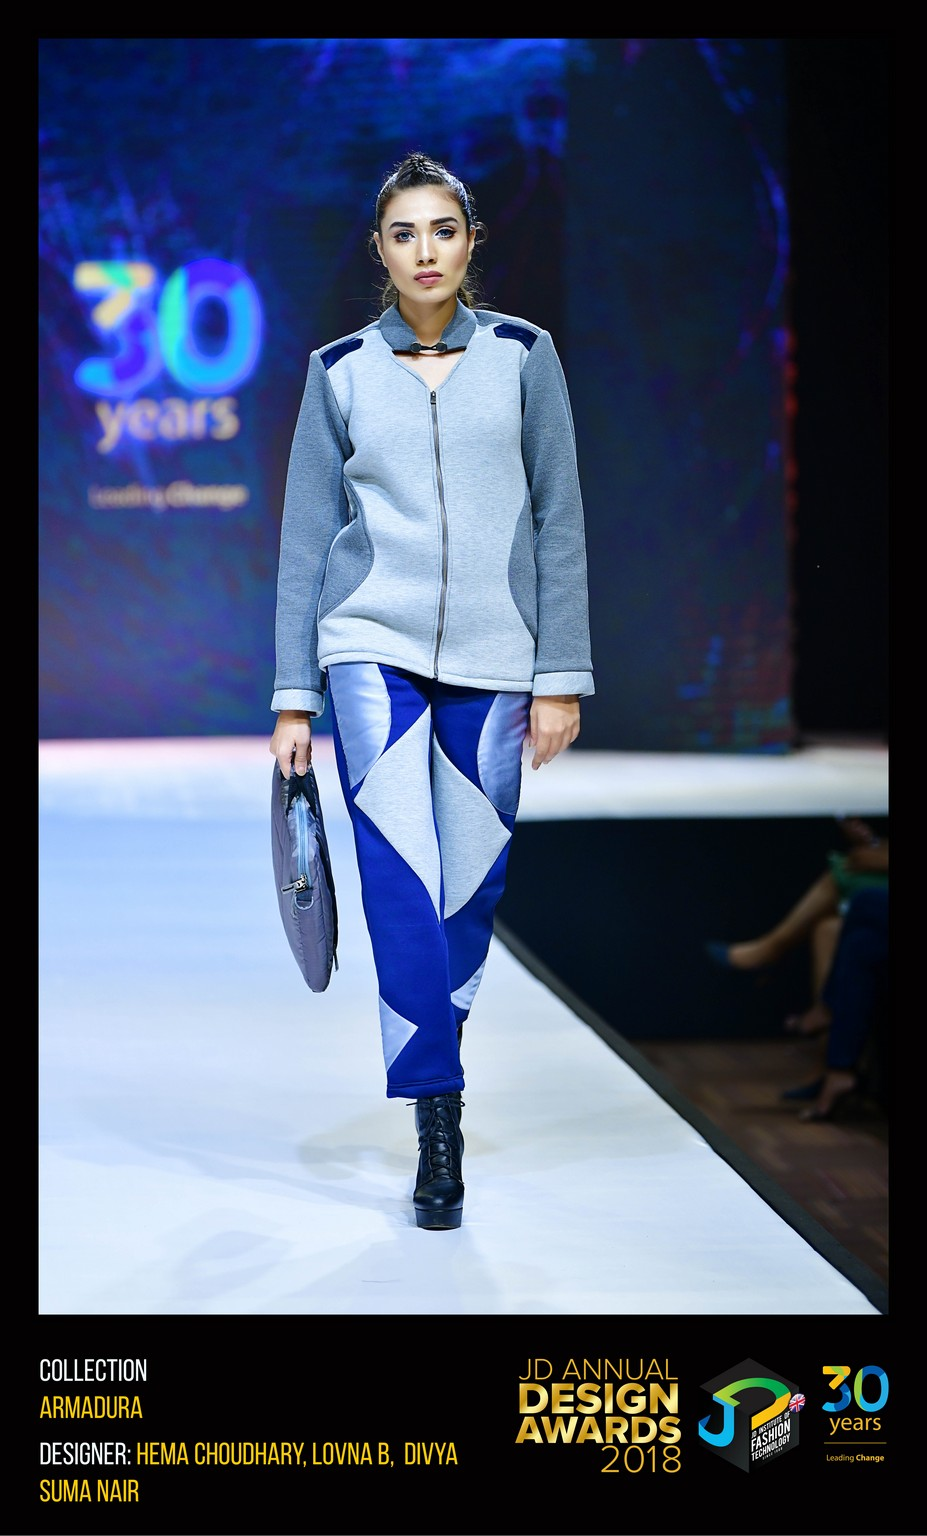 Armadura Collection – Change – JD Annual Design Awards 2018 | Designer: Hema, Lovna, Divya | Photography : Jerin Nath (@jerin_nath) armadura collection - ARMADURA5 - Armadura Collection – Change – JD Annual Design Awards 2018